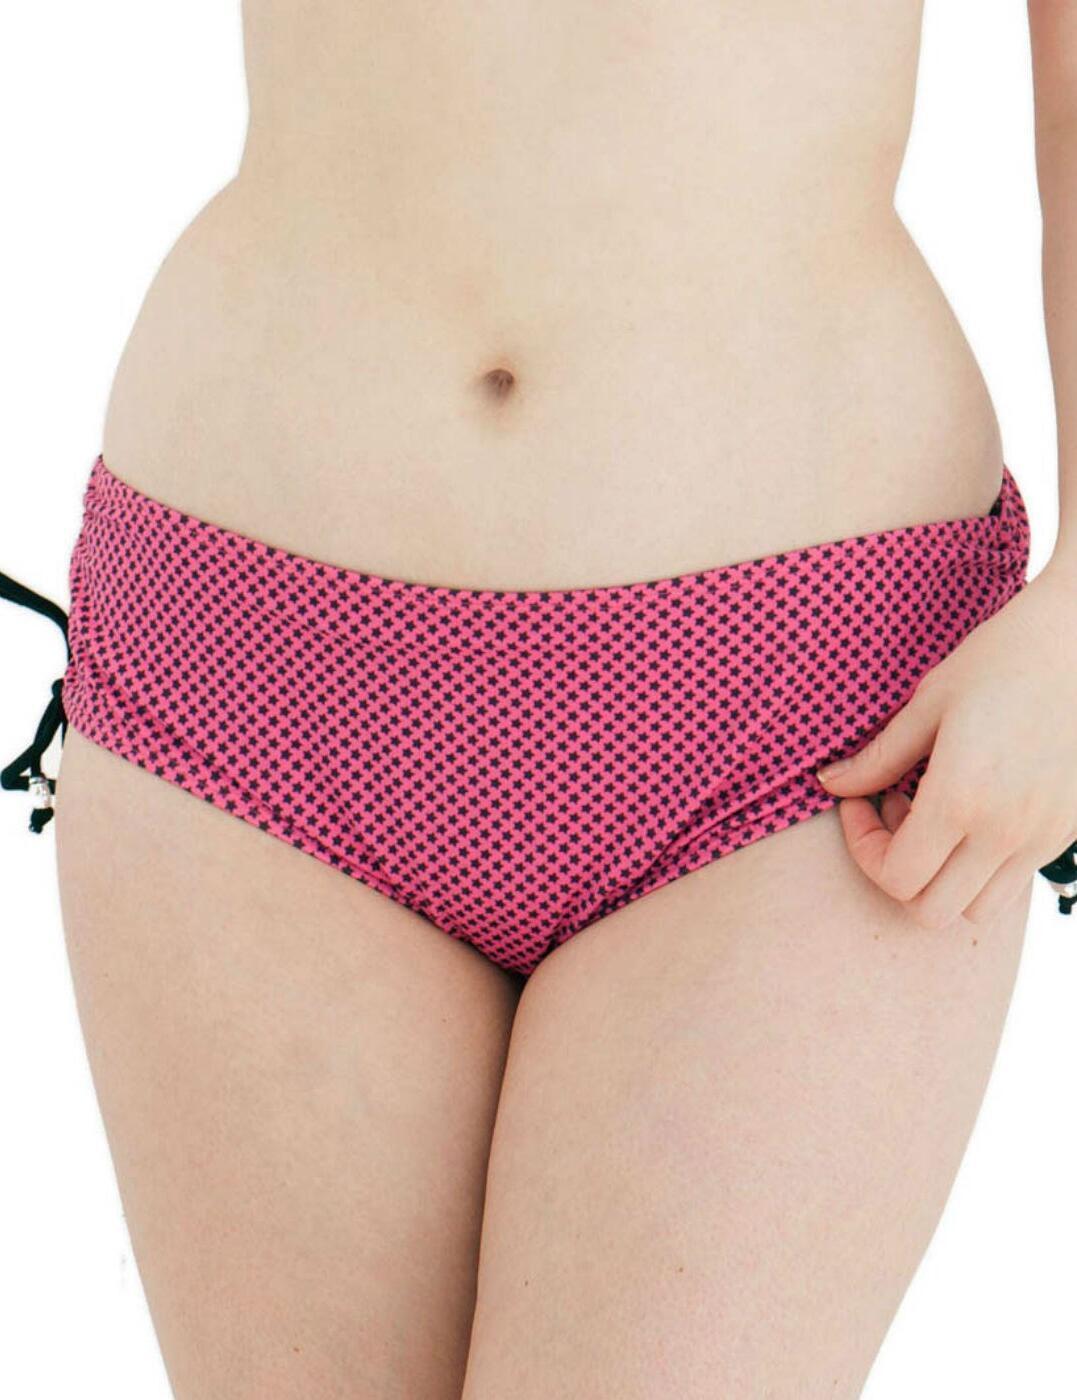 CS2213 Curvy Kate Starry Eyed Bikini Short - CS2213 Bikini Short